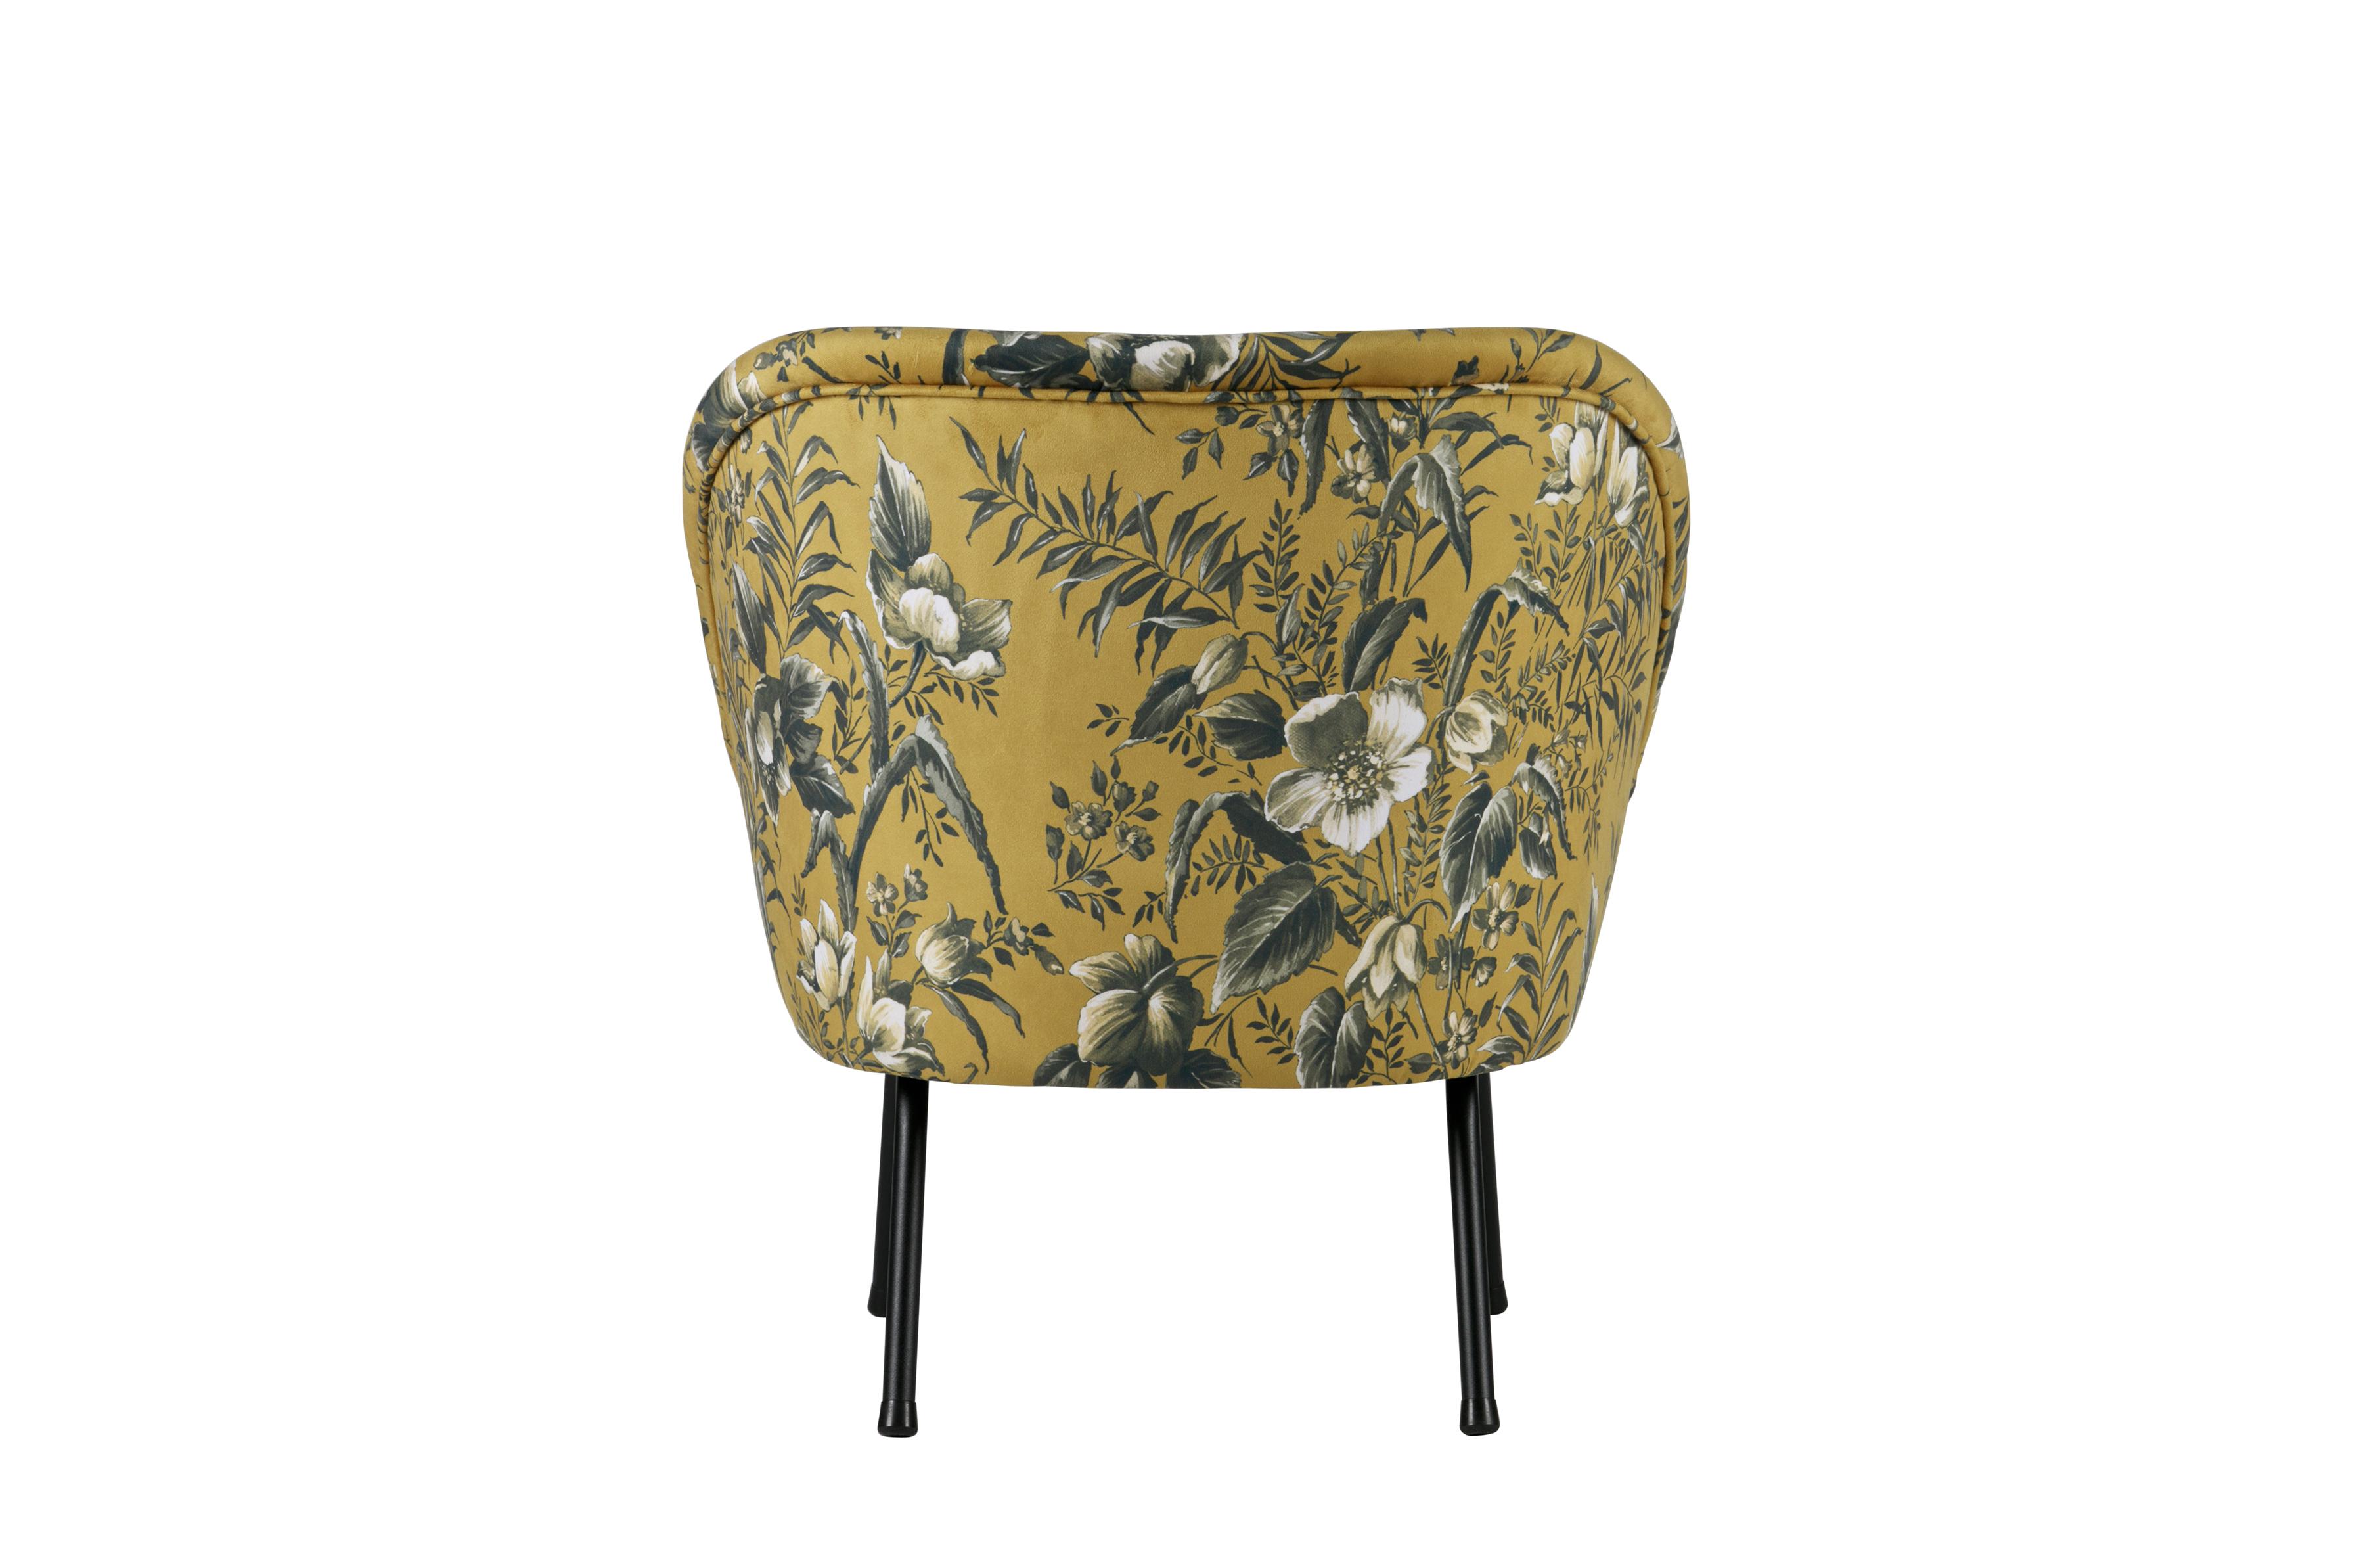 Vogue fauteuil fluweel poppy interieurwinkel